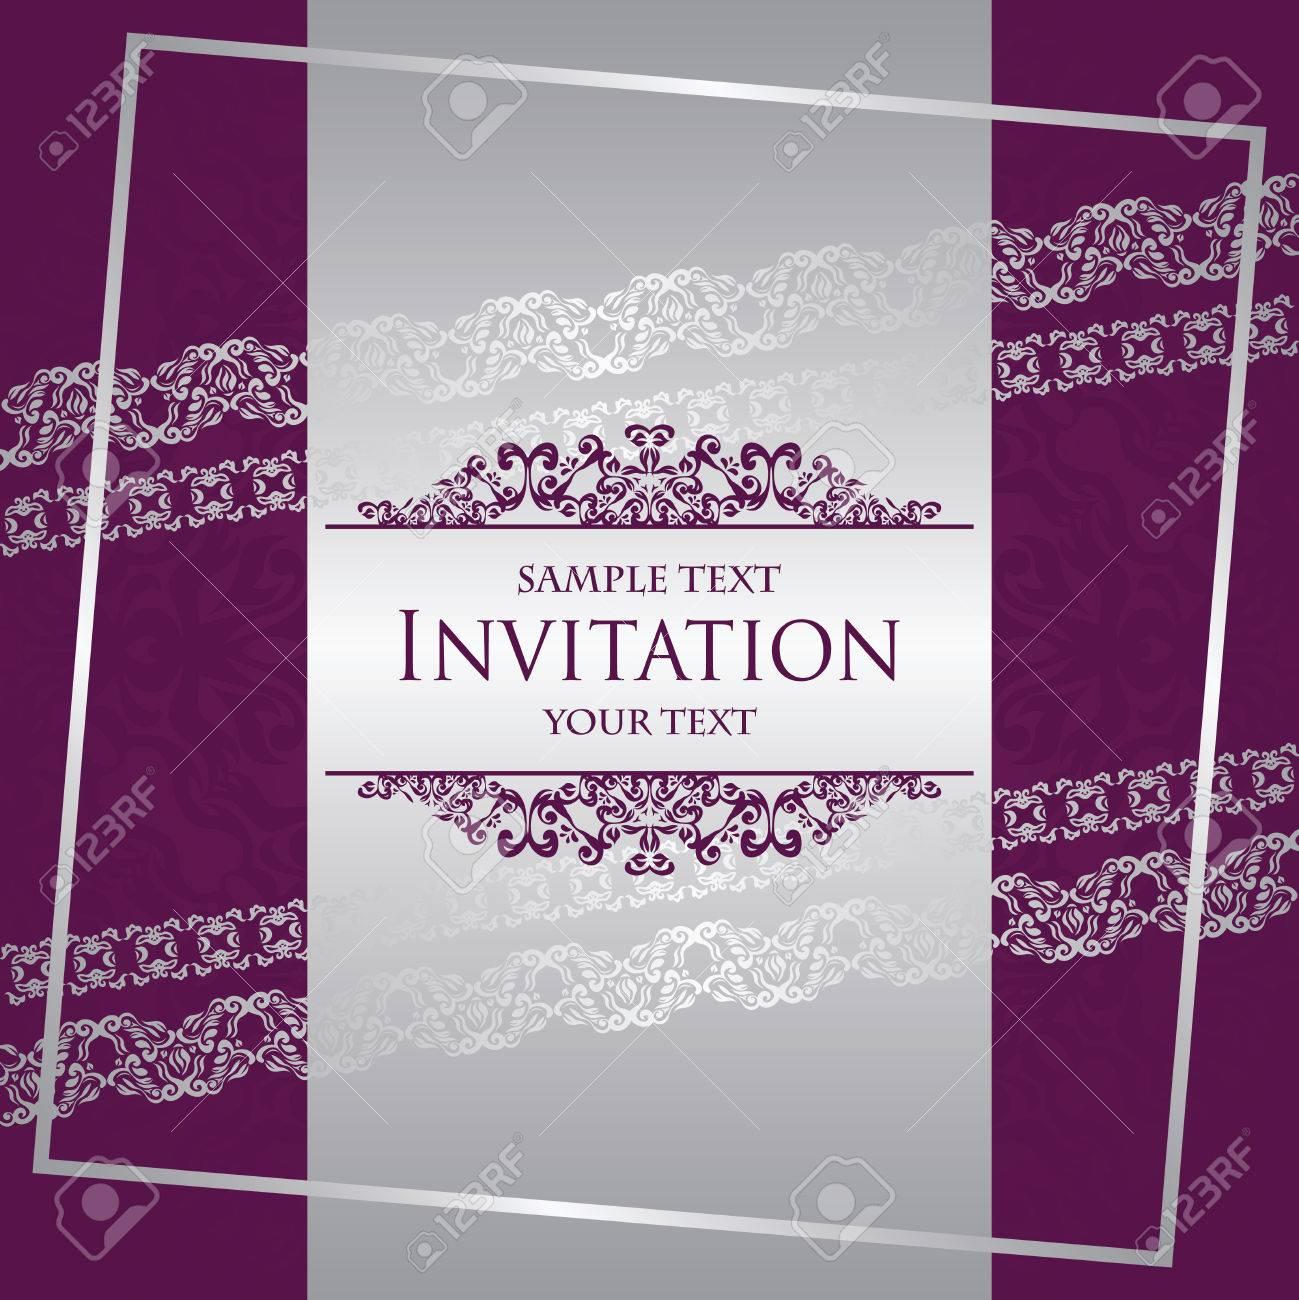 Invitation Card. Modern Invitation With Vintage Borders. Original ...